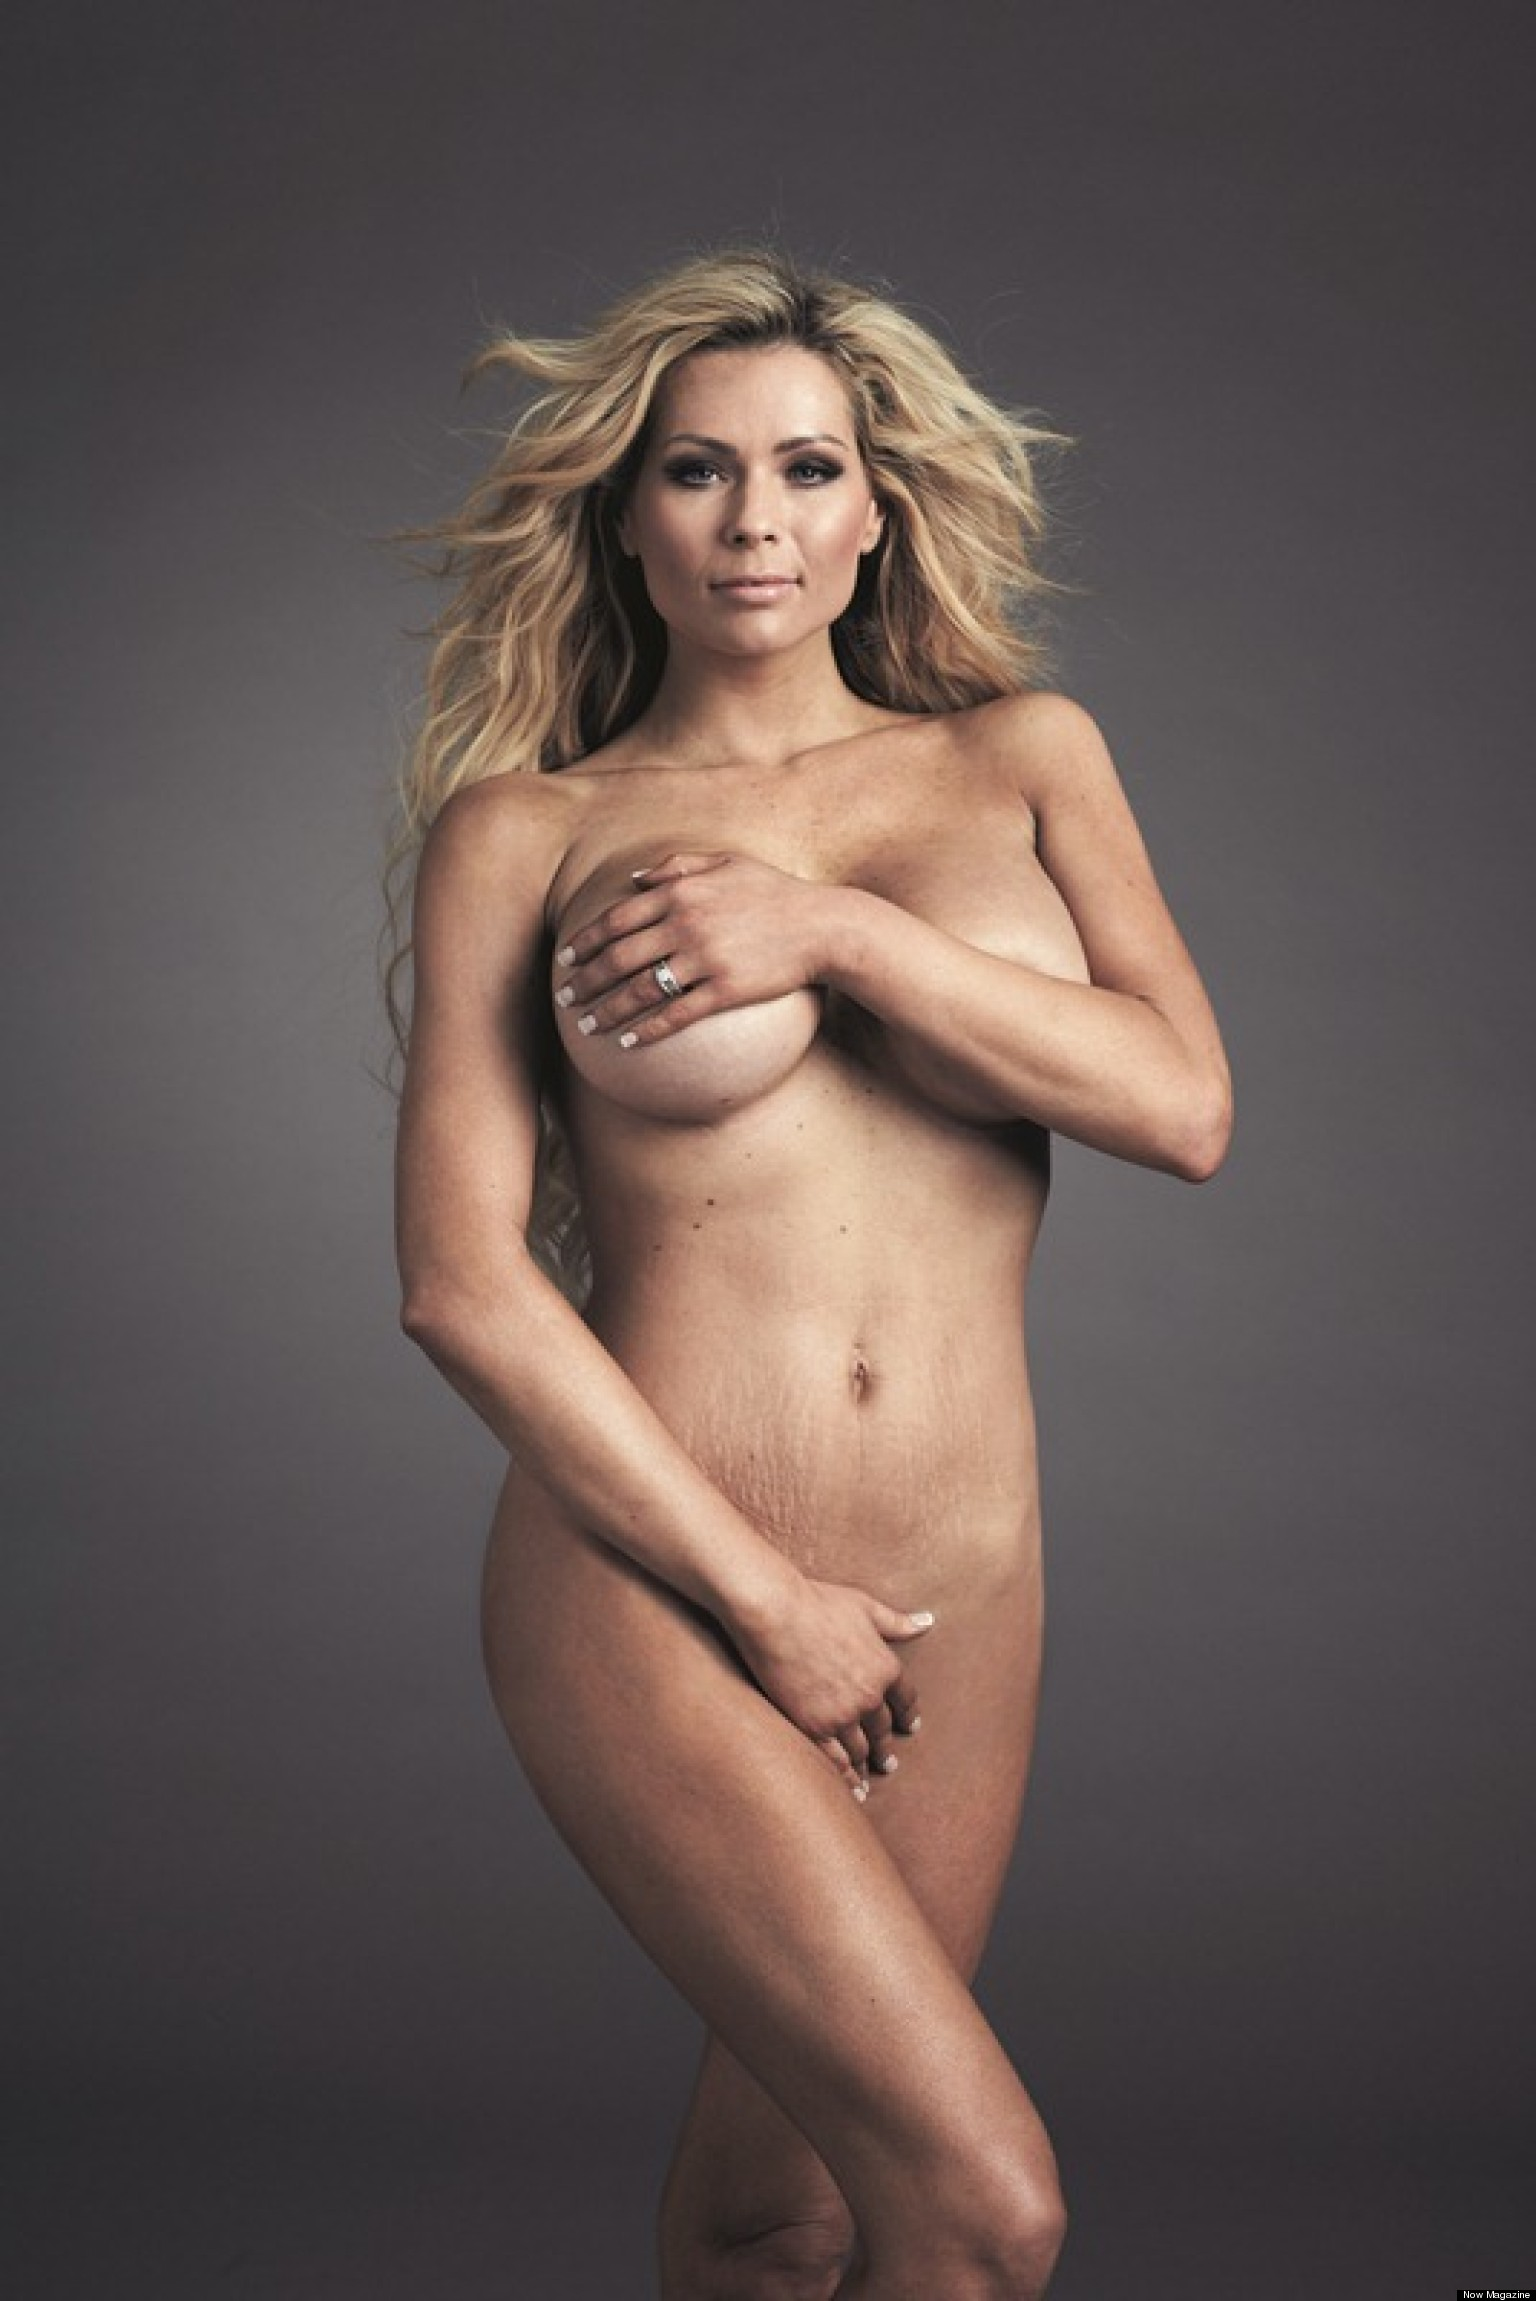 Jane mclean nude hentai movie